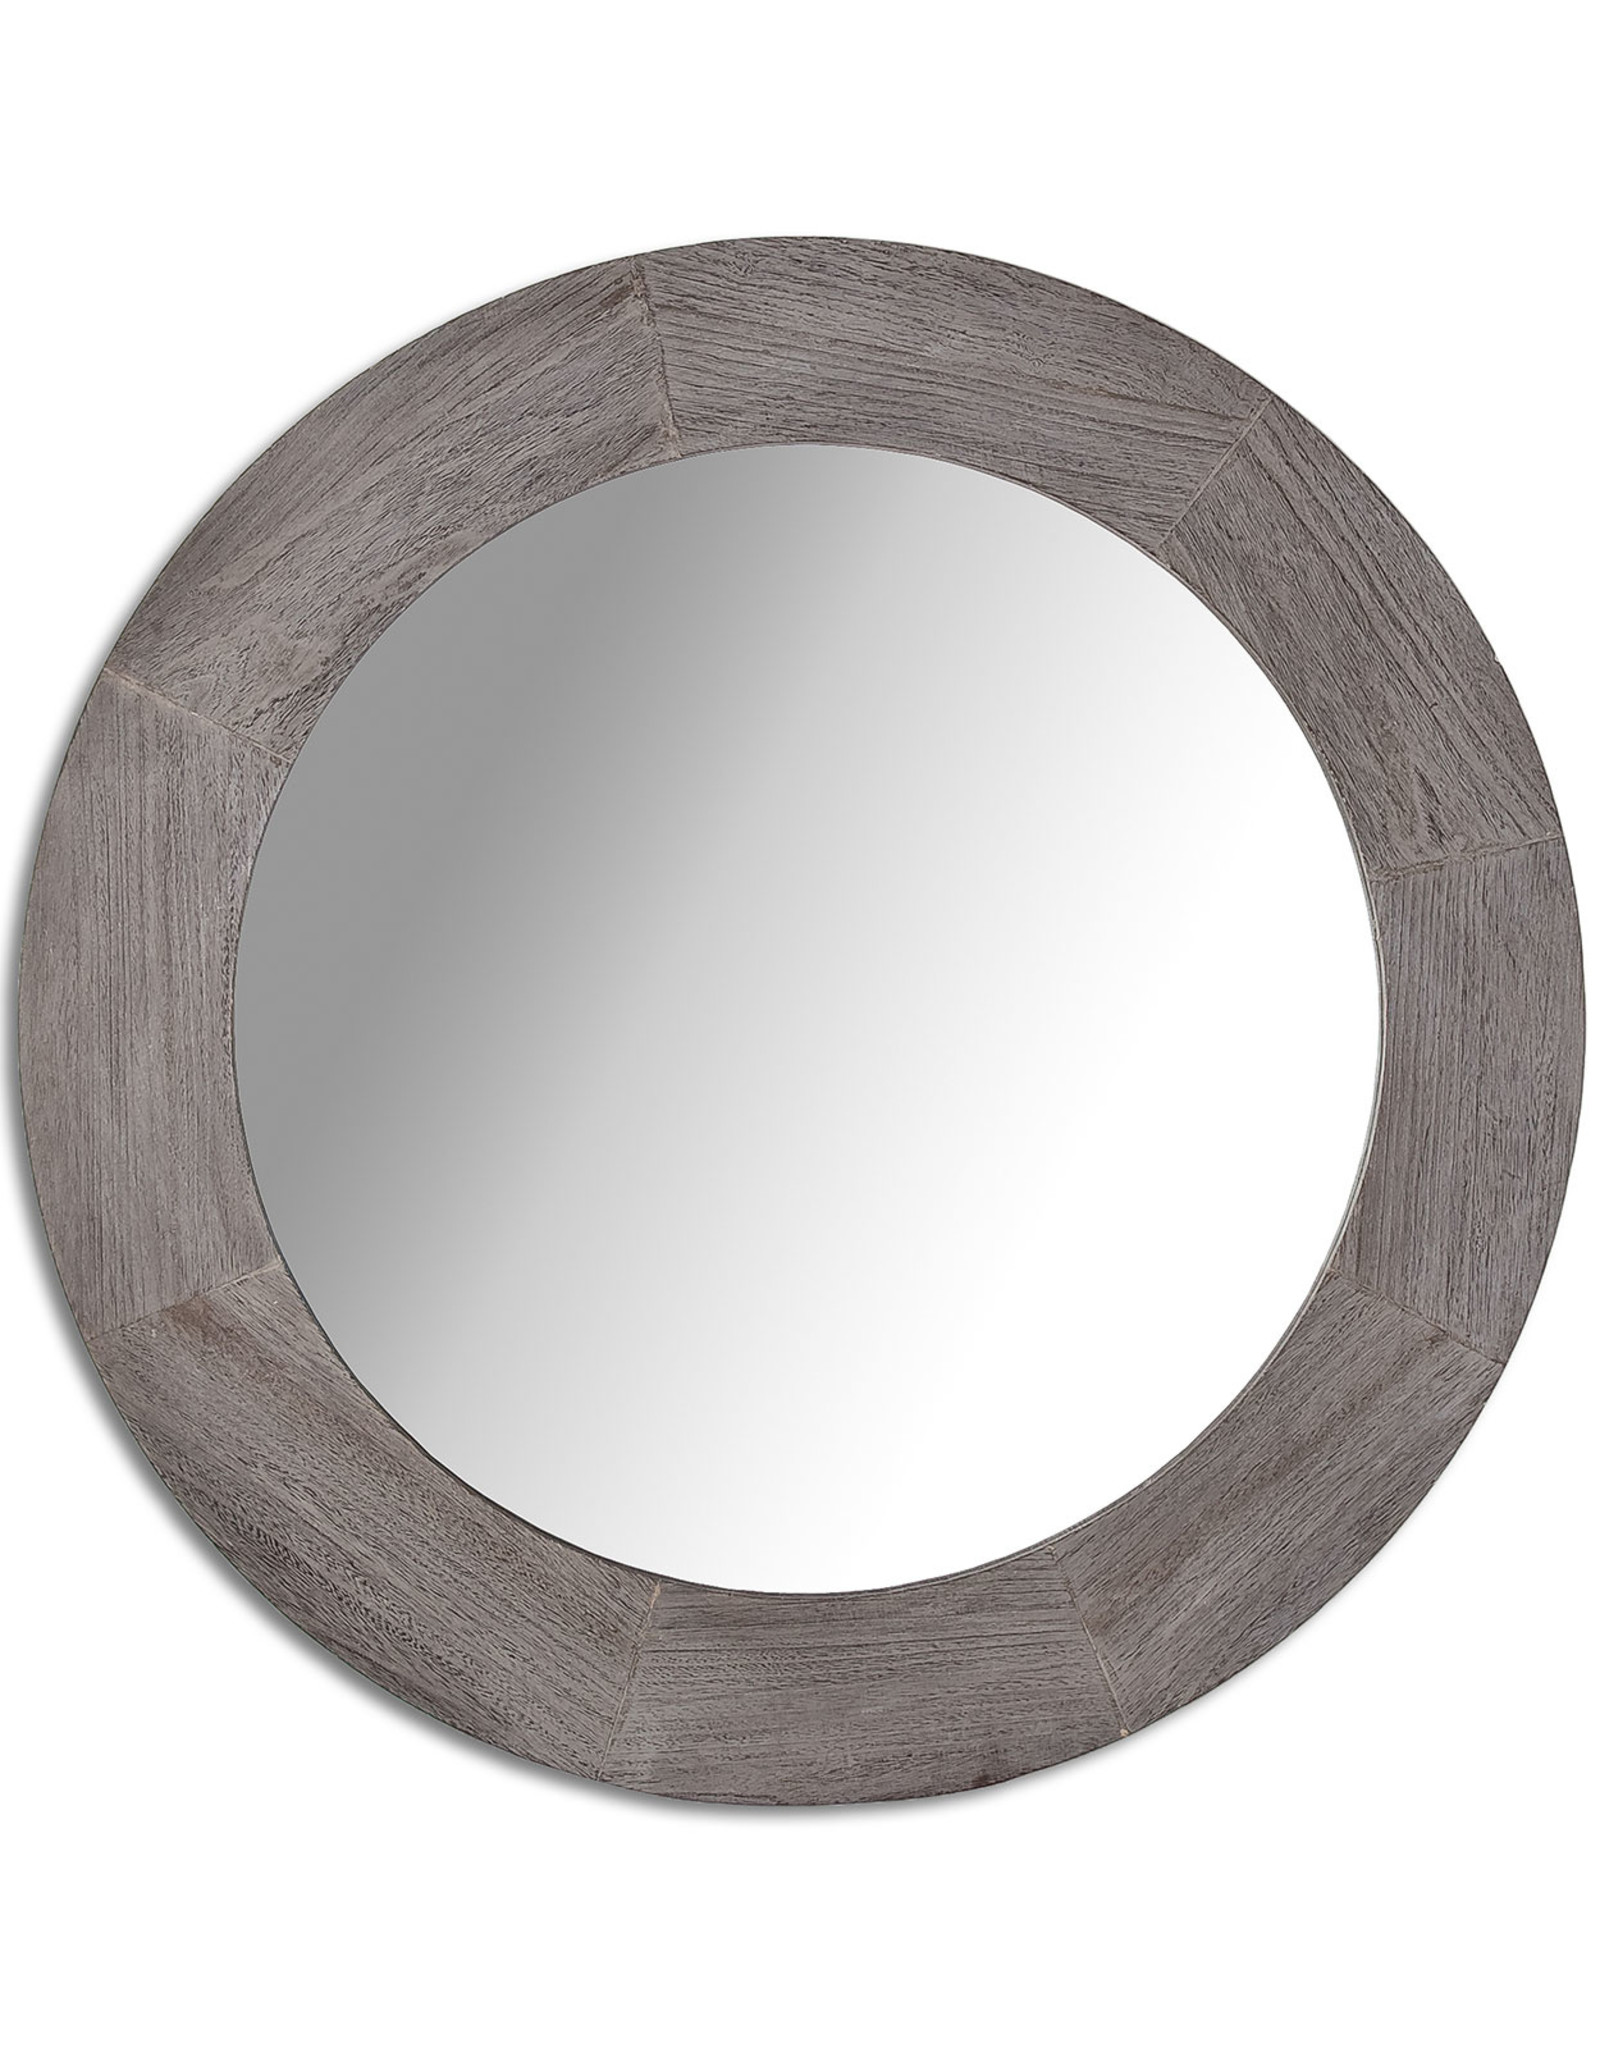 Style In Form Mirror SIF Round Bristol Dark Oak BOH-023